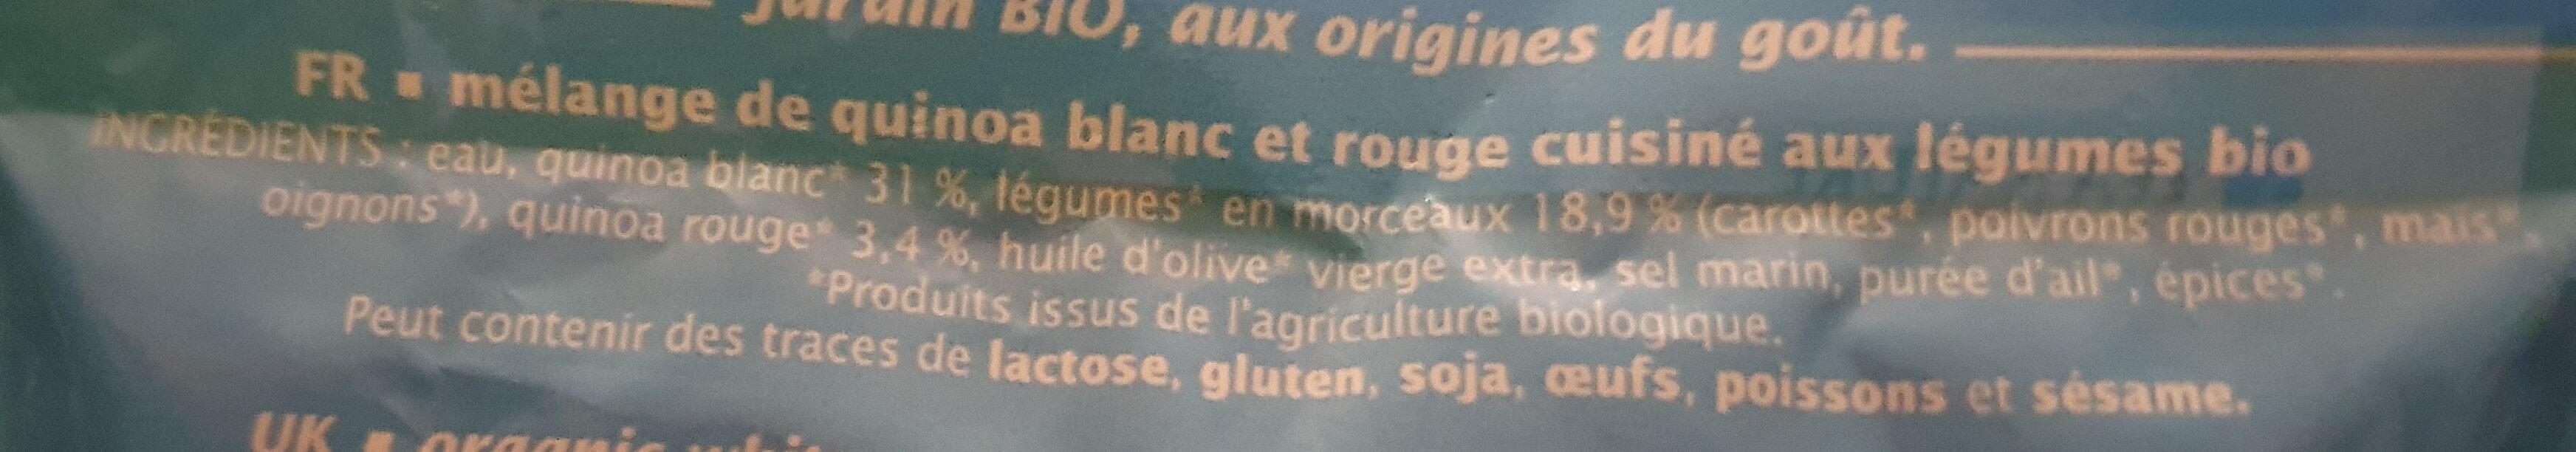 DUO DE QUINOA AUX LEGUMES - Ingrediënten - fr